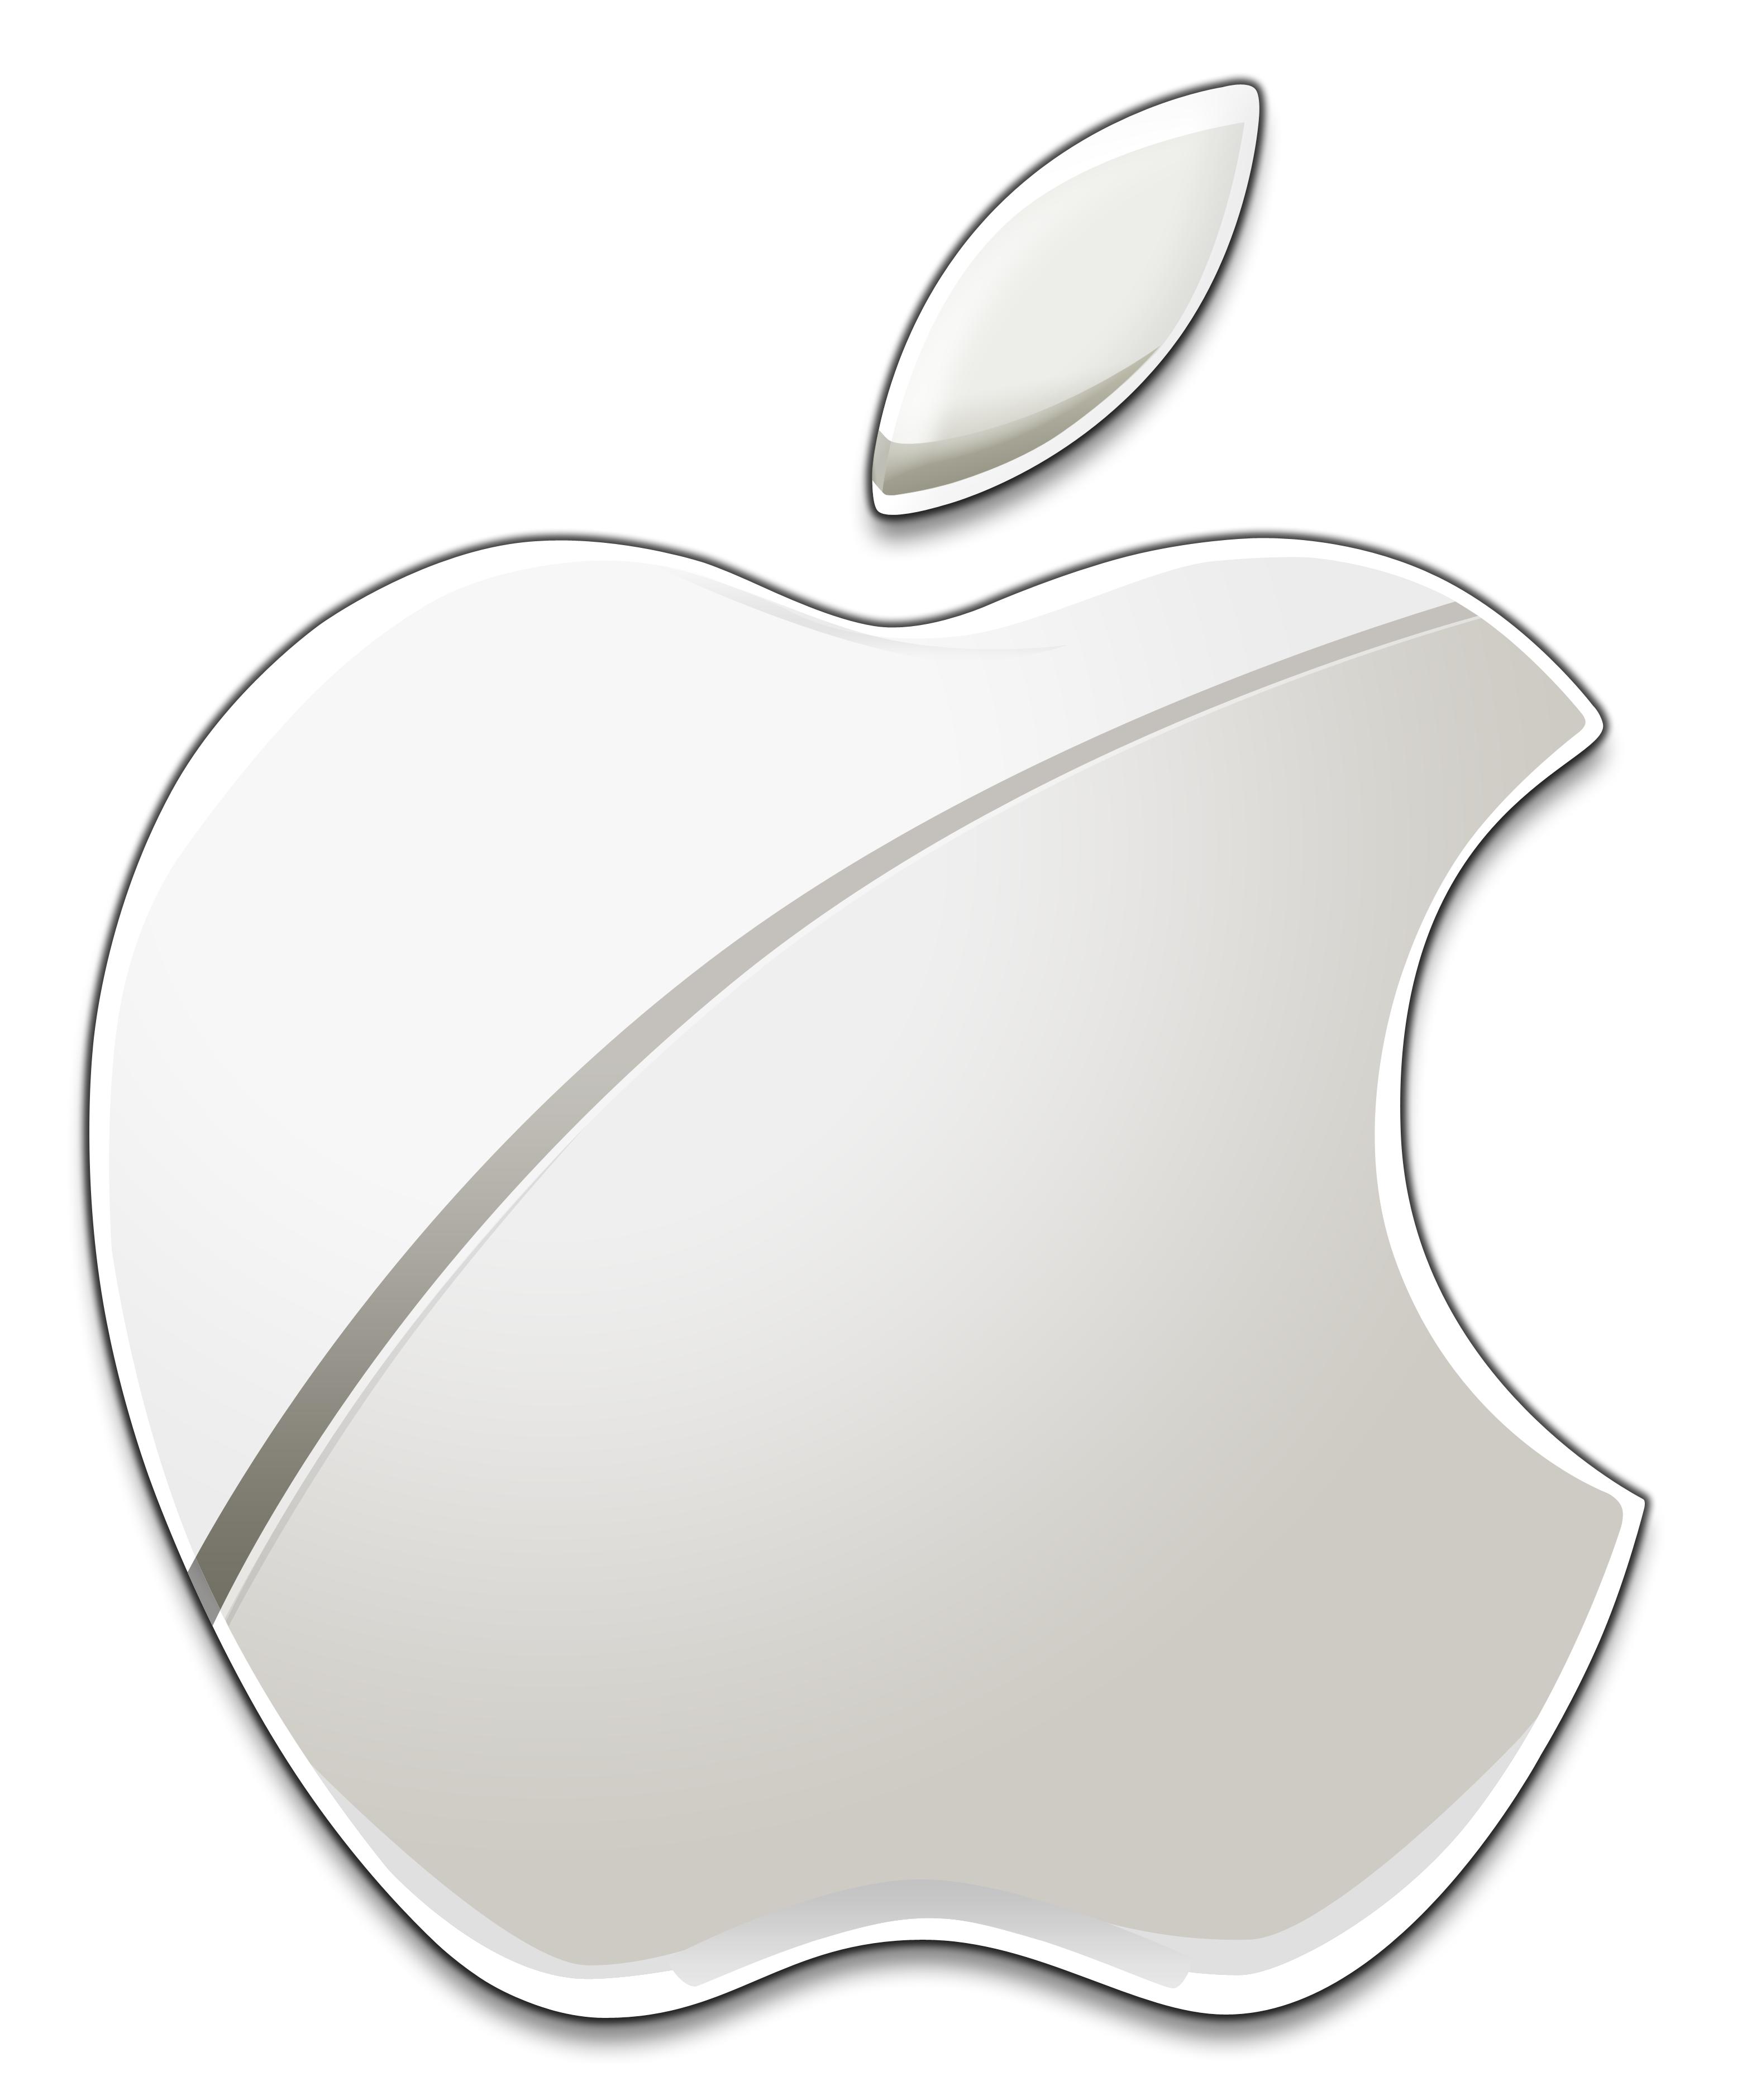 Apple Logo - Apple HD PNG